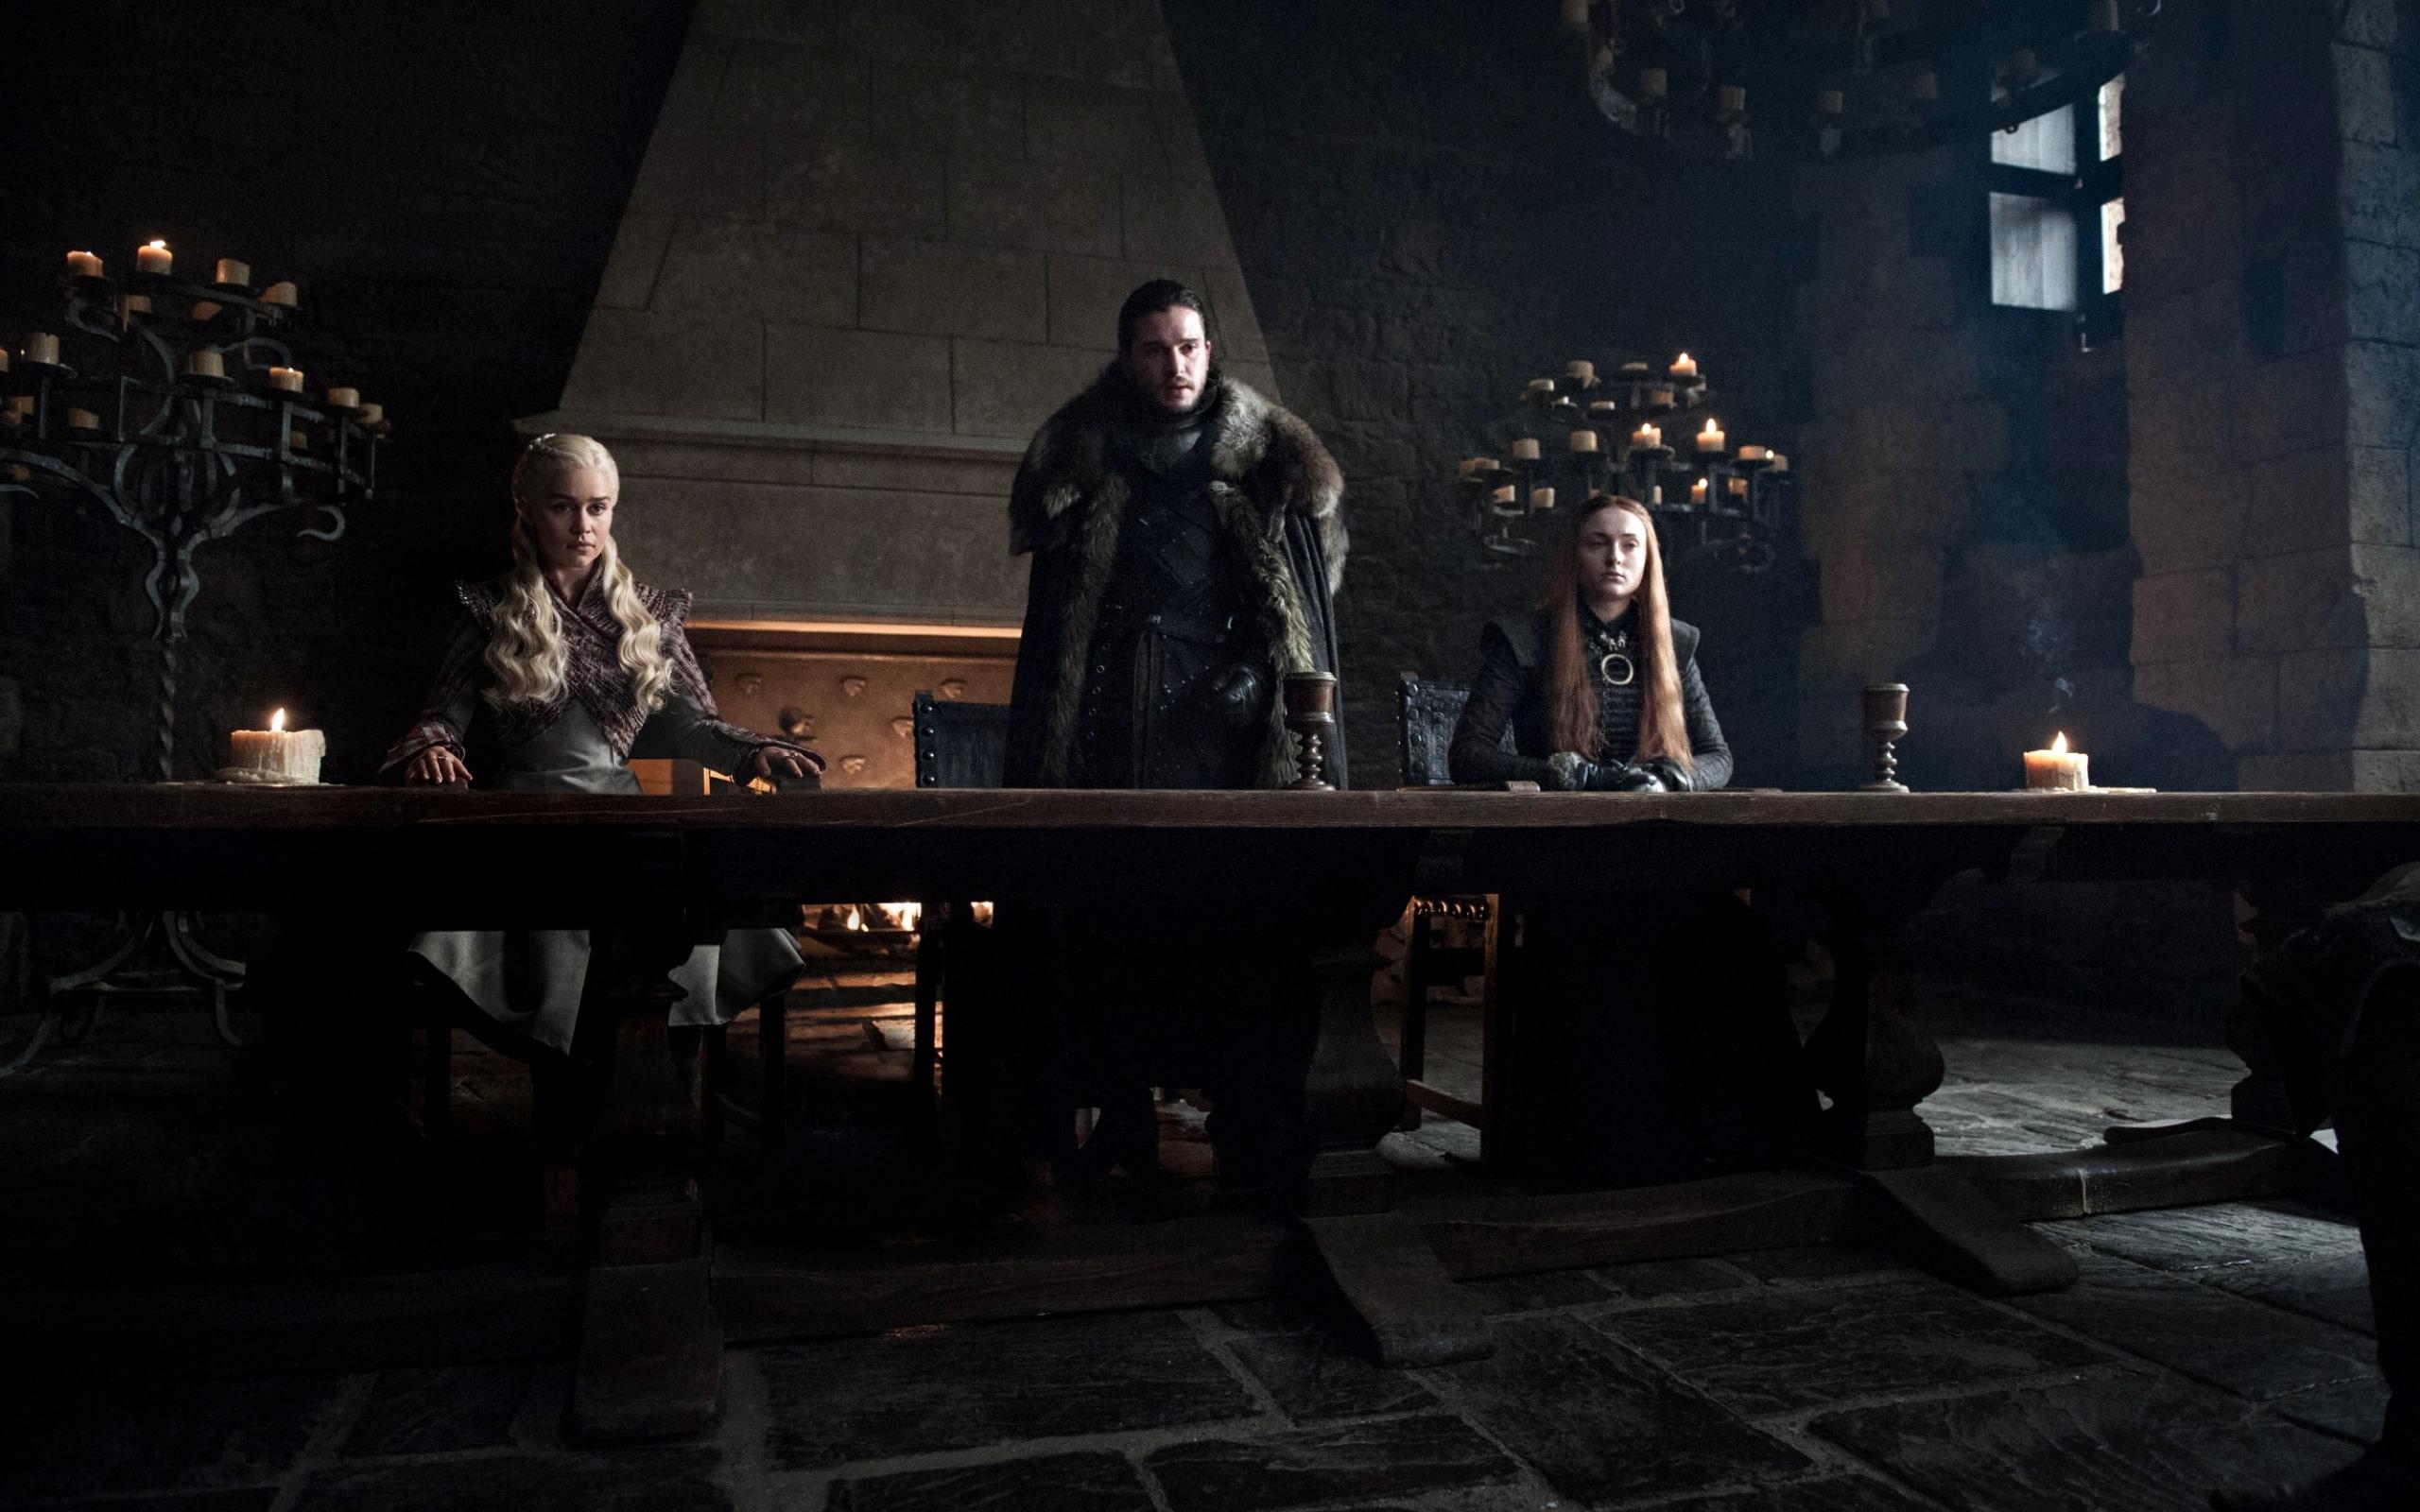 Wallpaper Of Daenerys Targaryen, Emilia Clarke, Game - Game Of Thrones Northern Council - HD Wallpaper